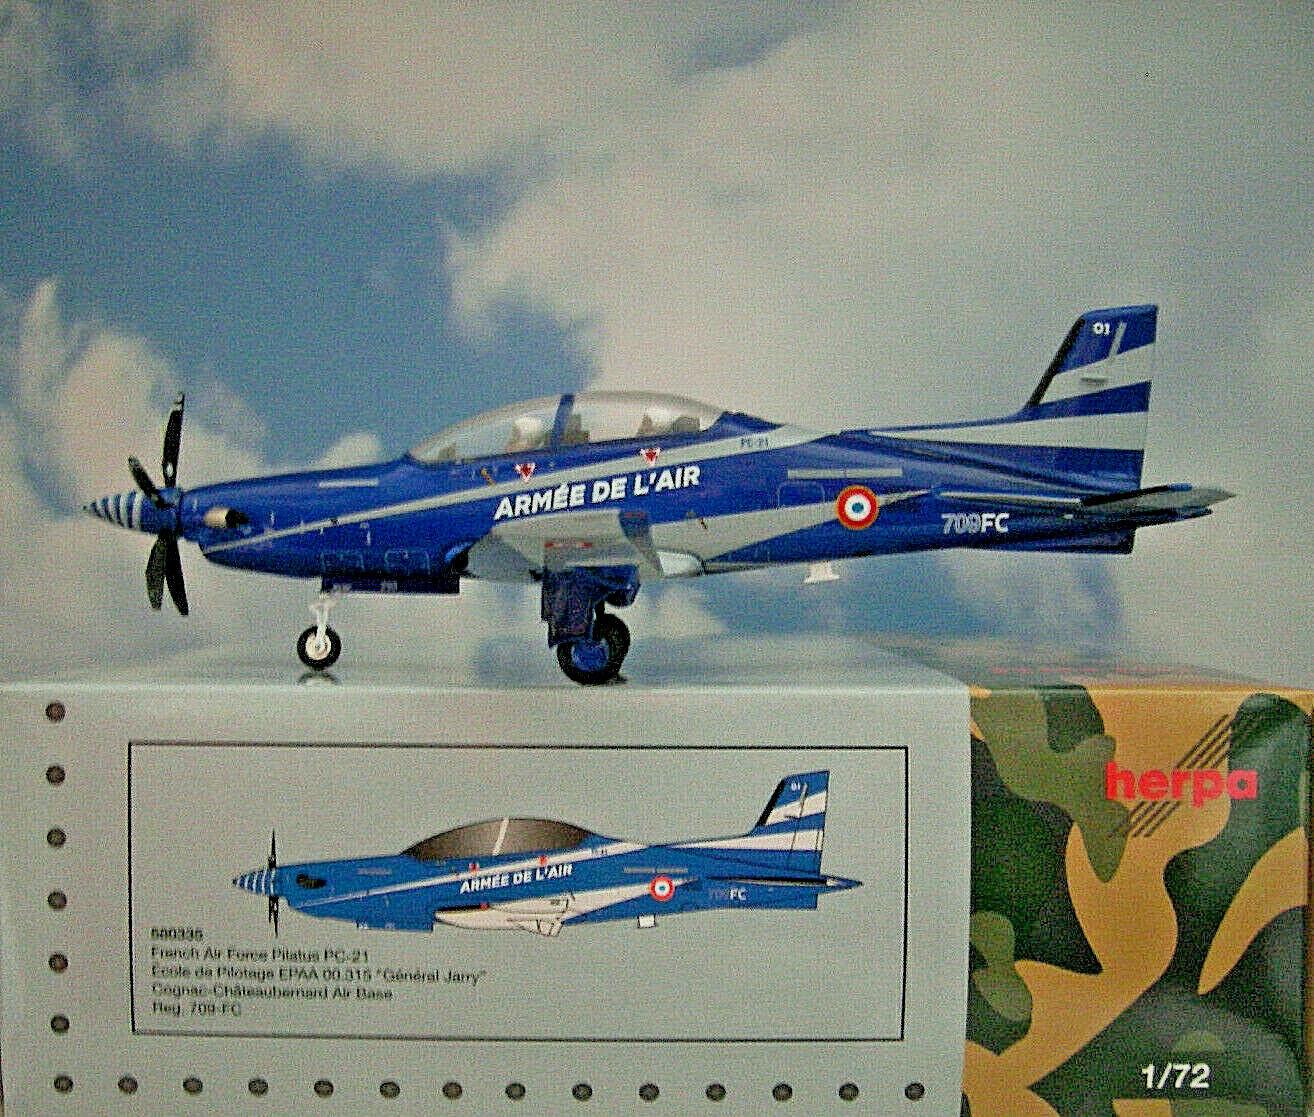 Herpa Ali 1 72 Pilatus Pc-21 French French French Aeronautica 709-fc + Display Stand 580335 b1241f